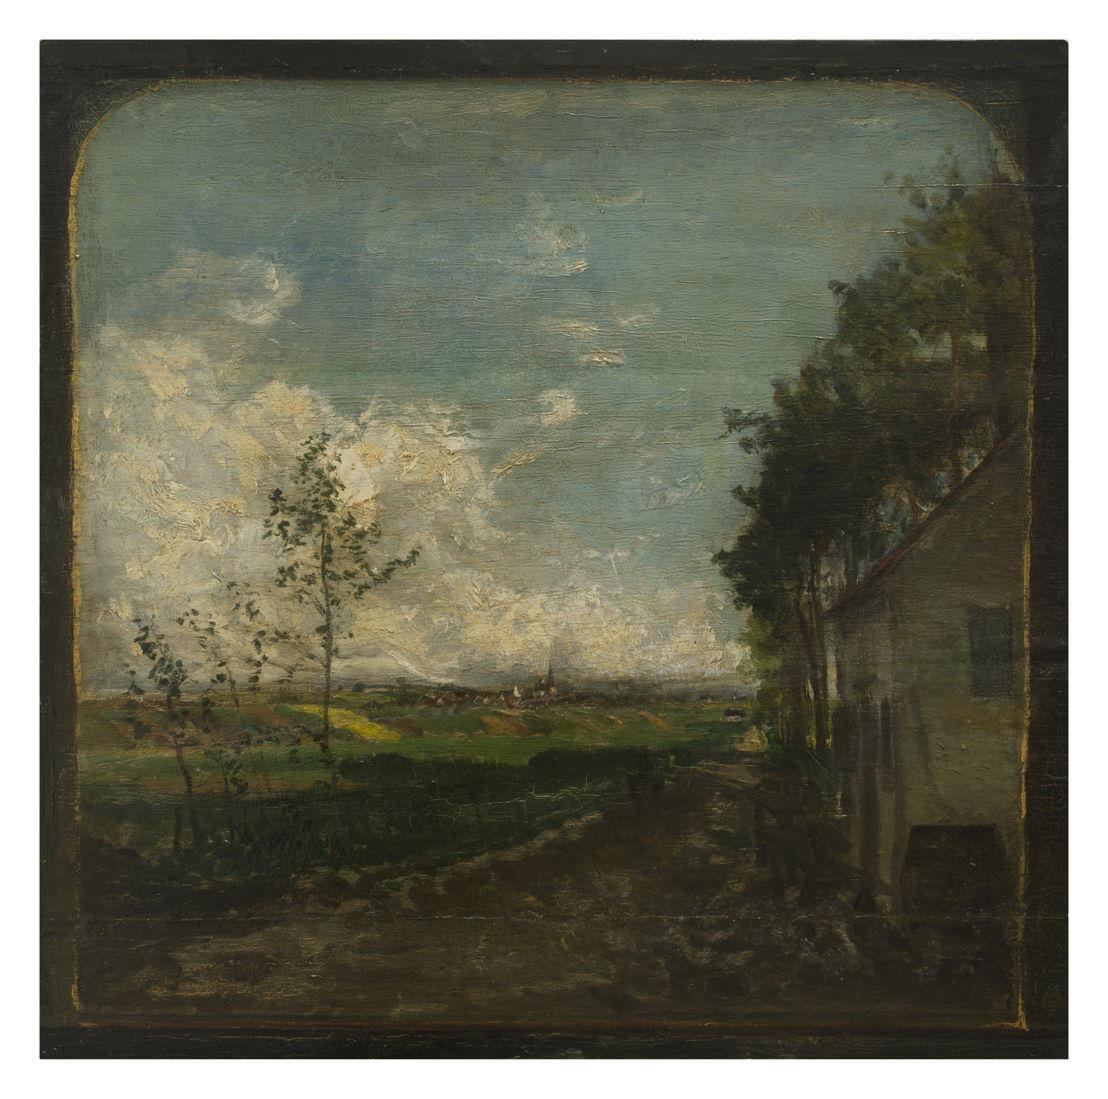 Hippolyte Boulenger, Uithangbord van 't Oud Bareelke © Isabelle Arthuis